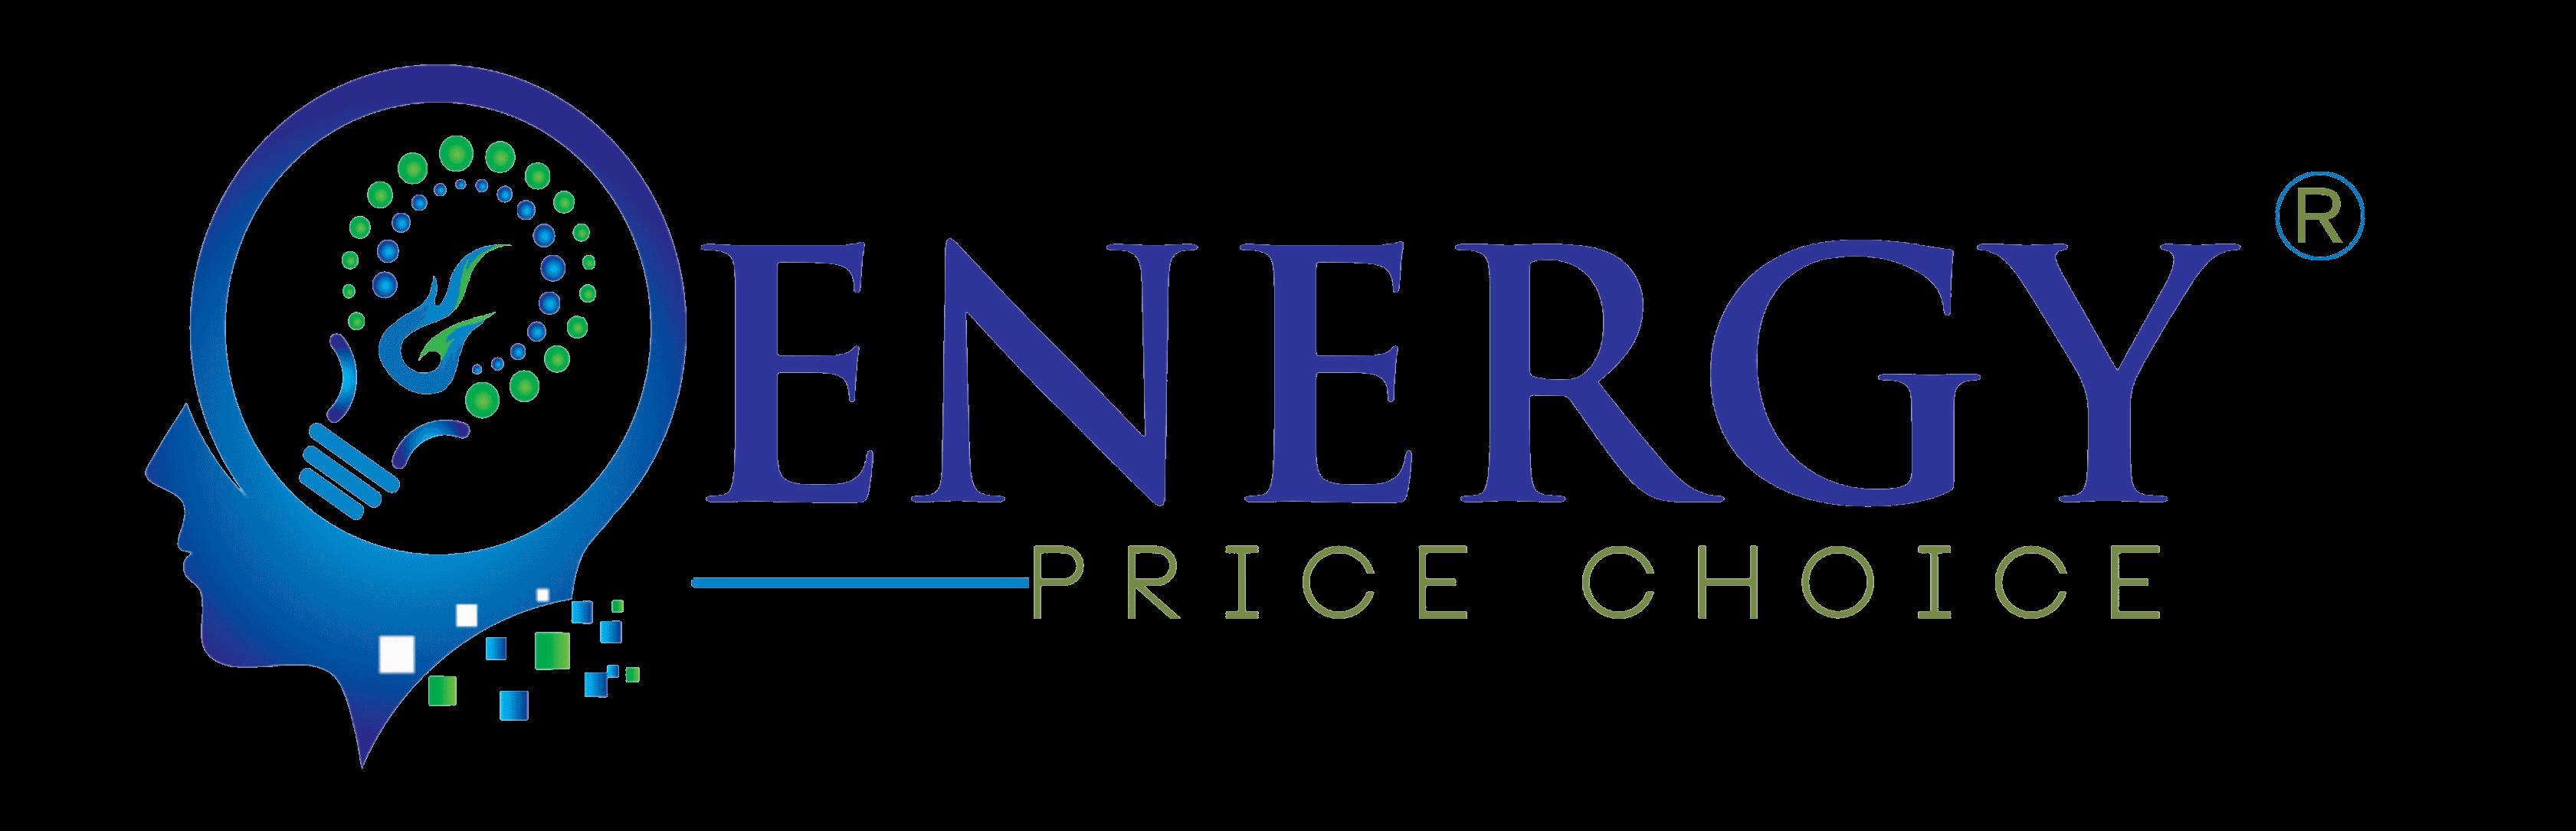 Energy Price Choice